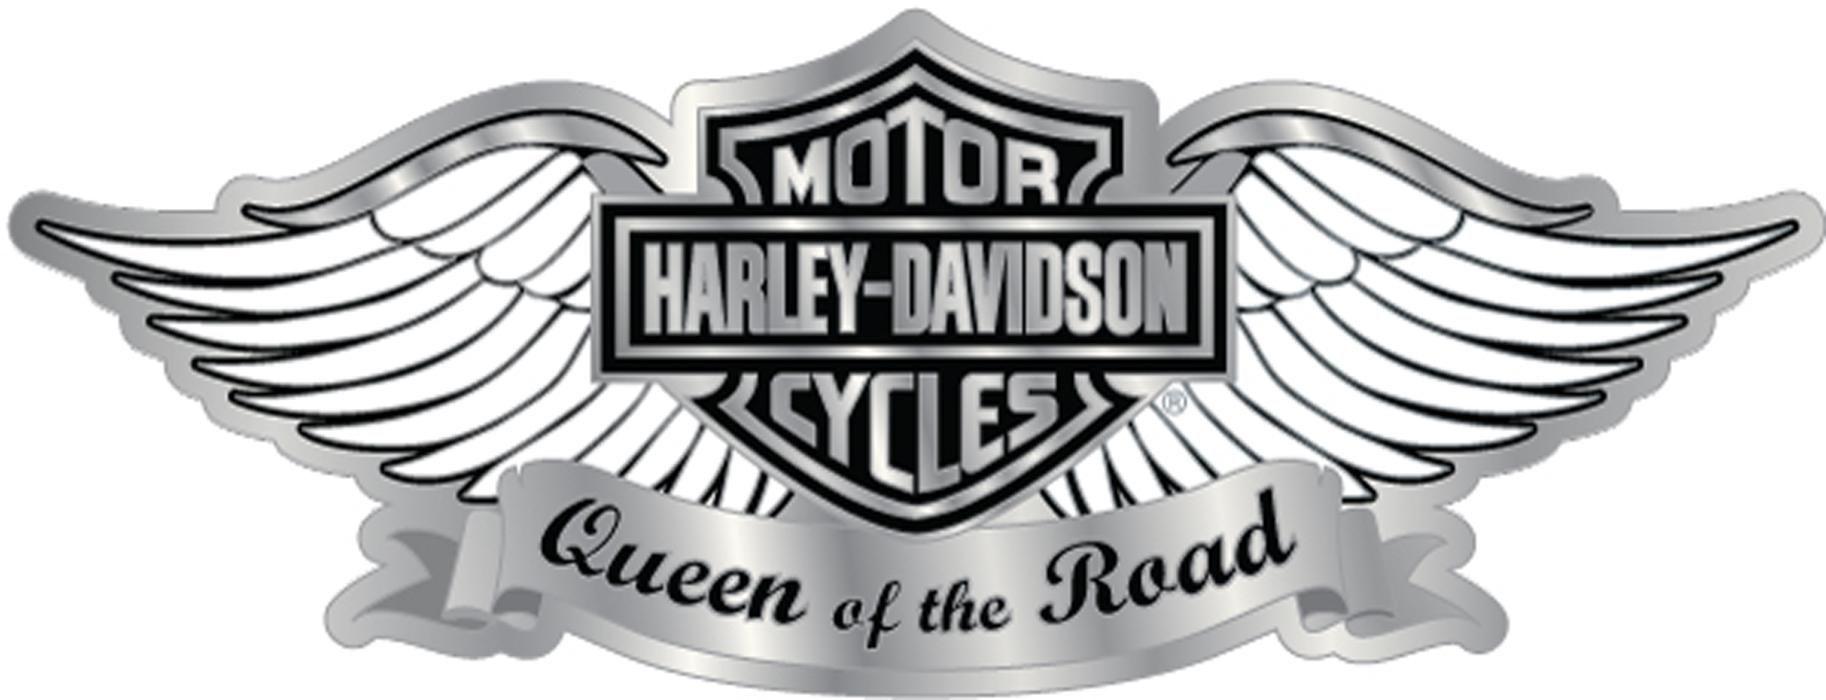 Image Result For Harley Davidson Symbol Drawings T Shirt Ideas